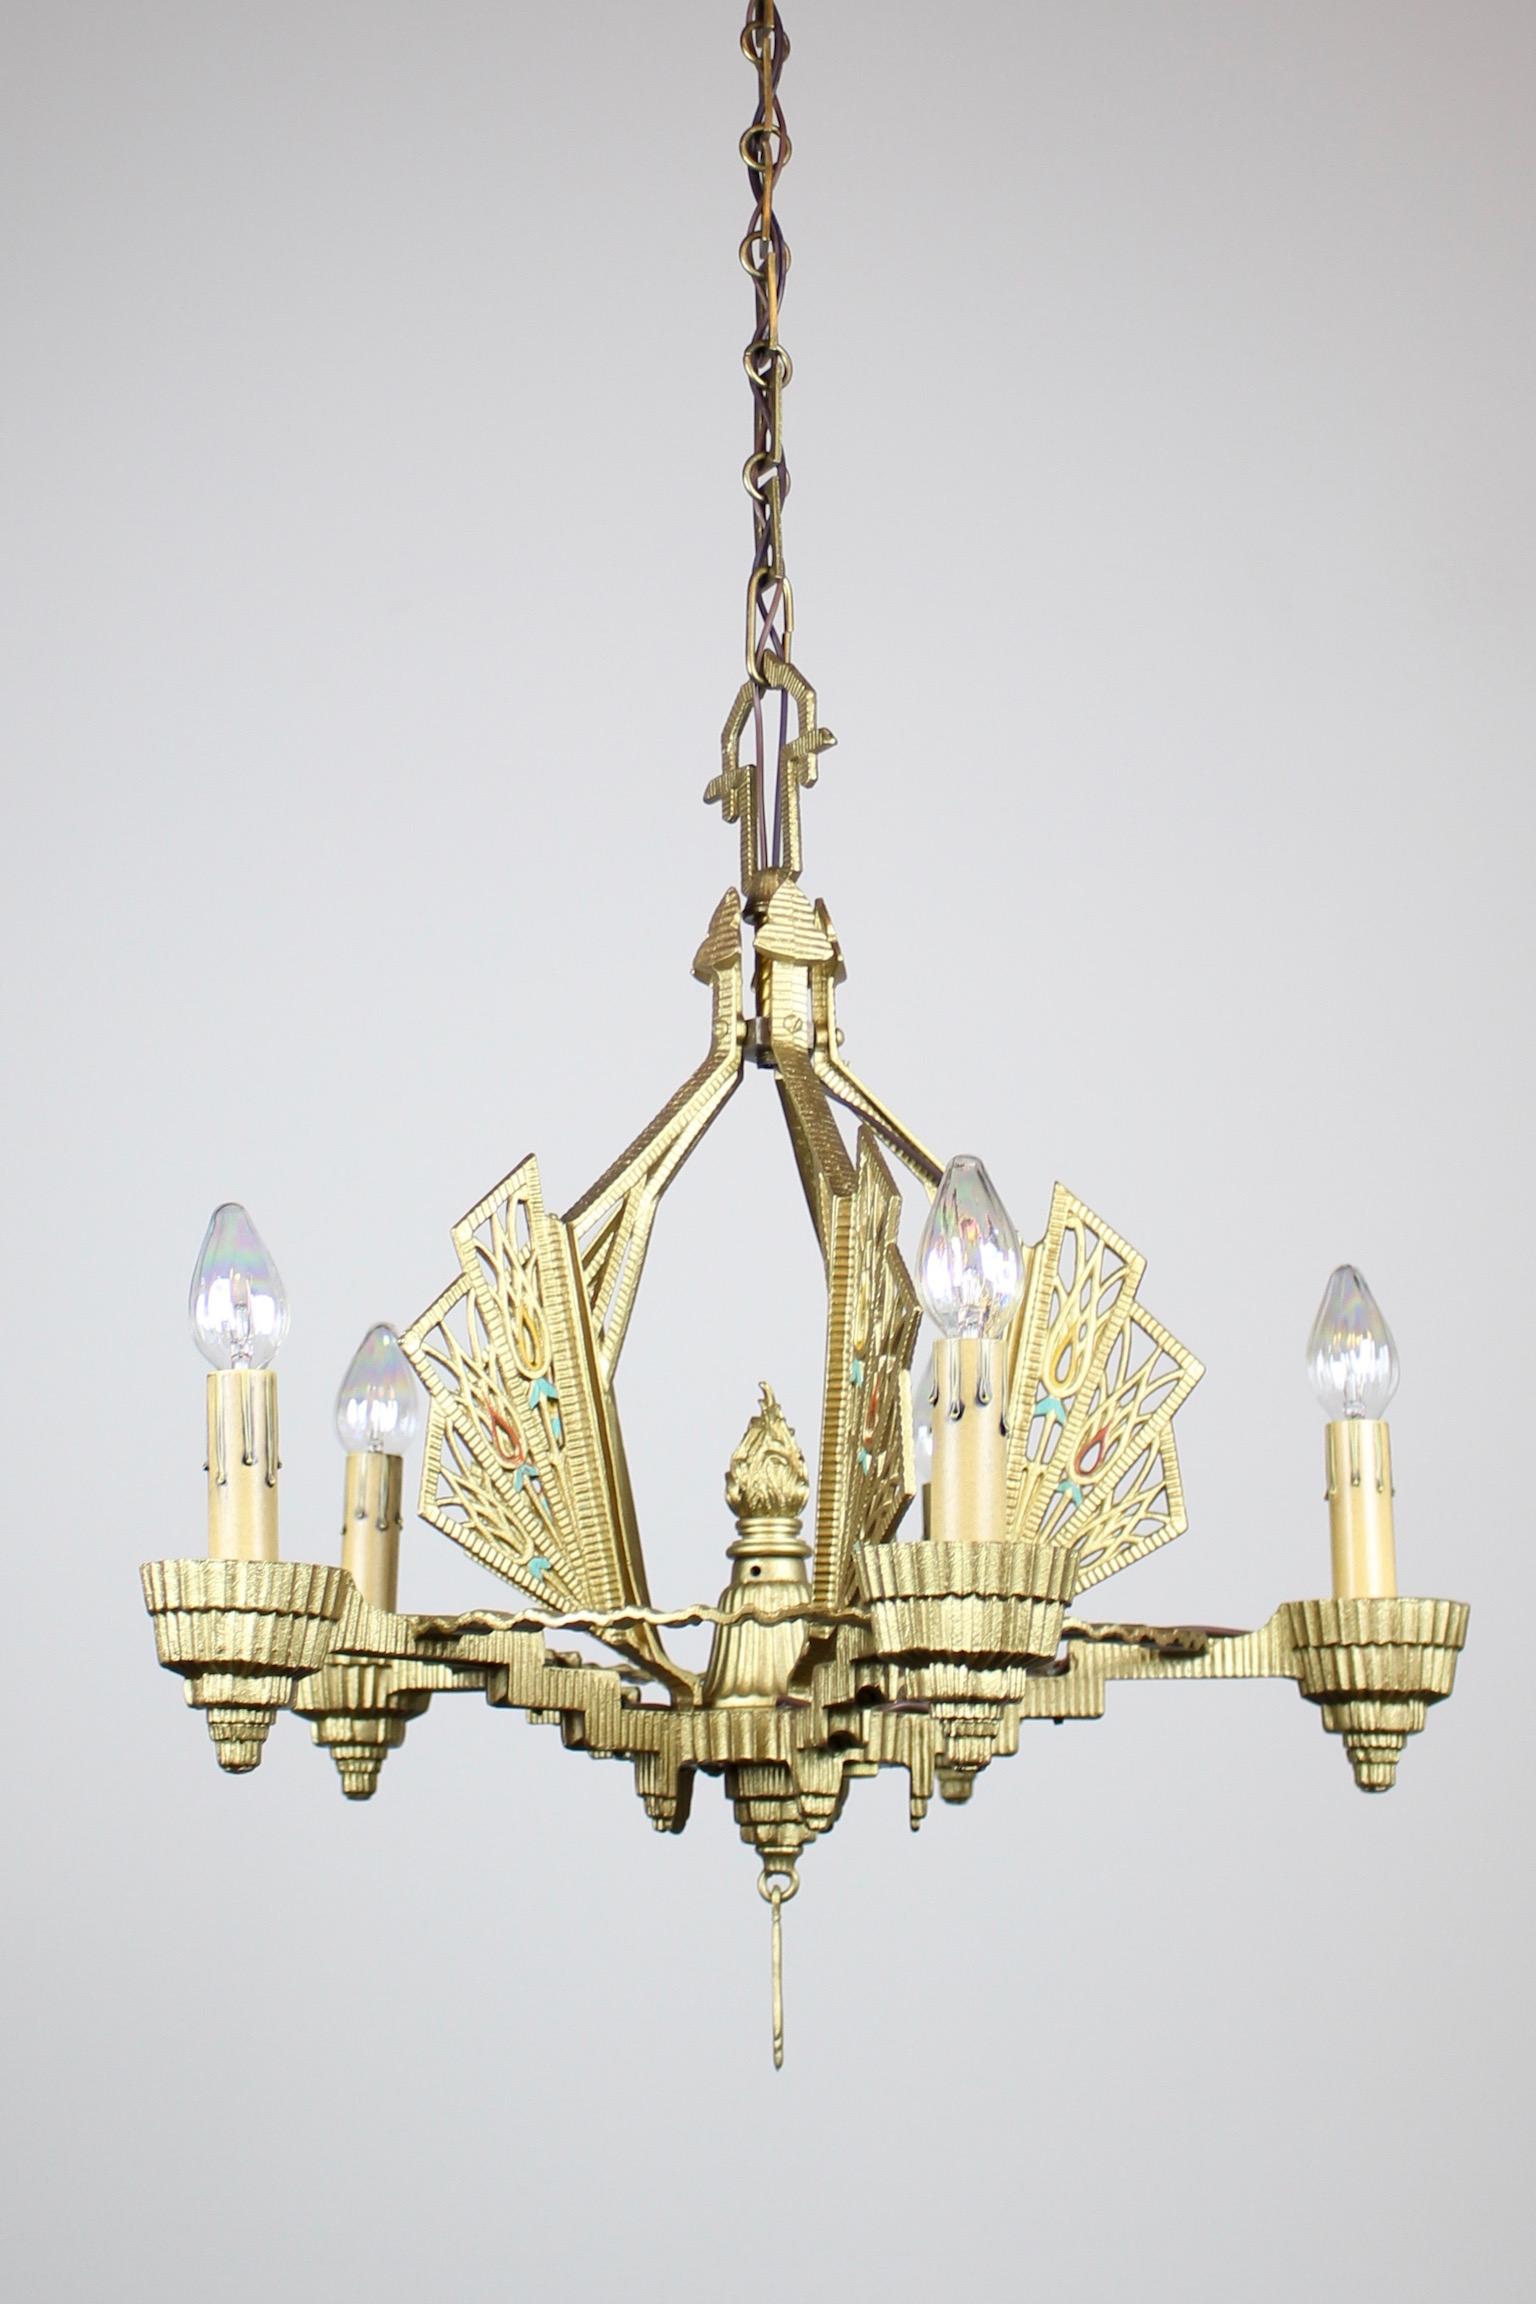 Art Deco Fixture With Polychrome Finish 5 Light